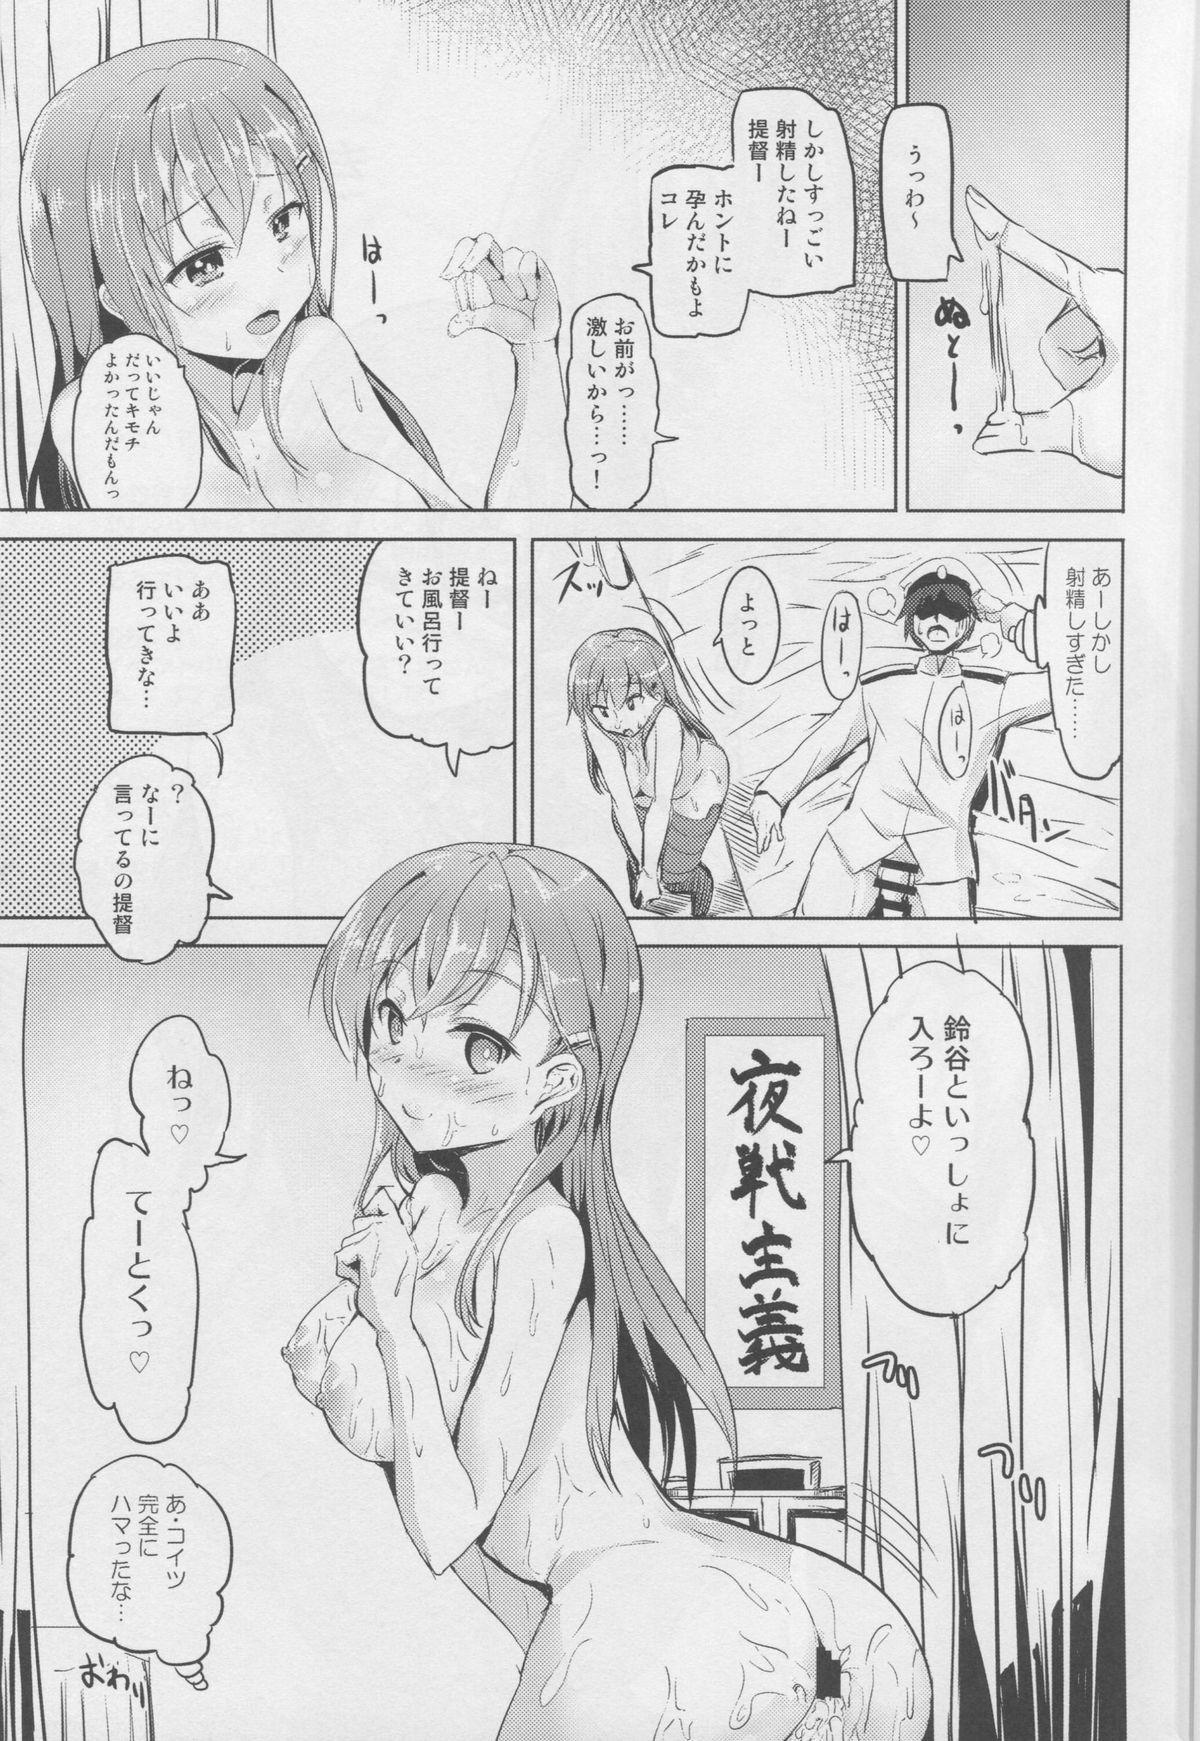 Suzuya no Hajimete 21